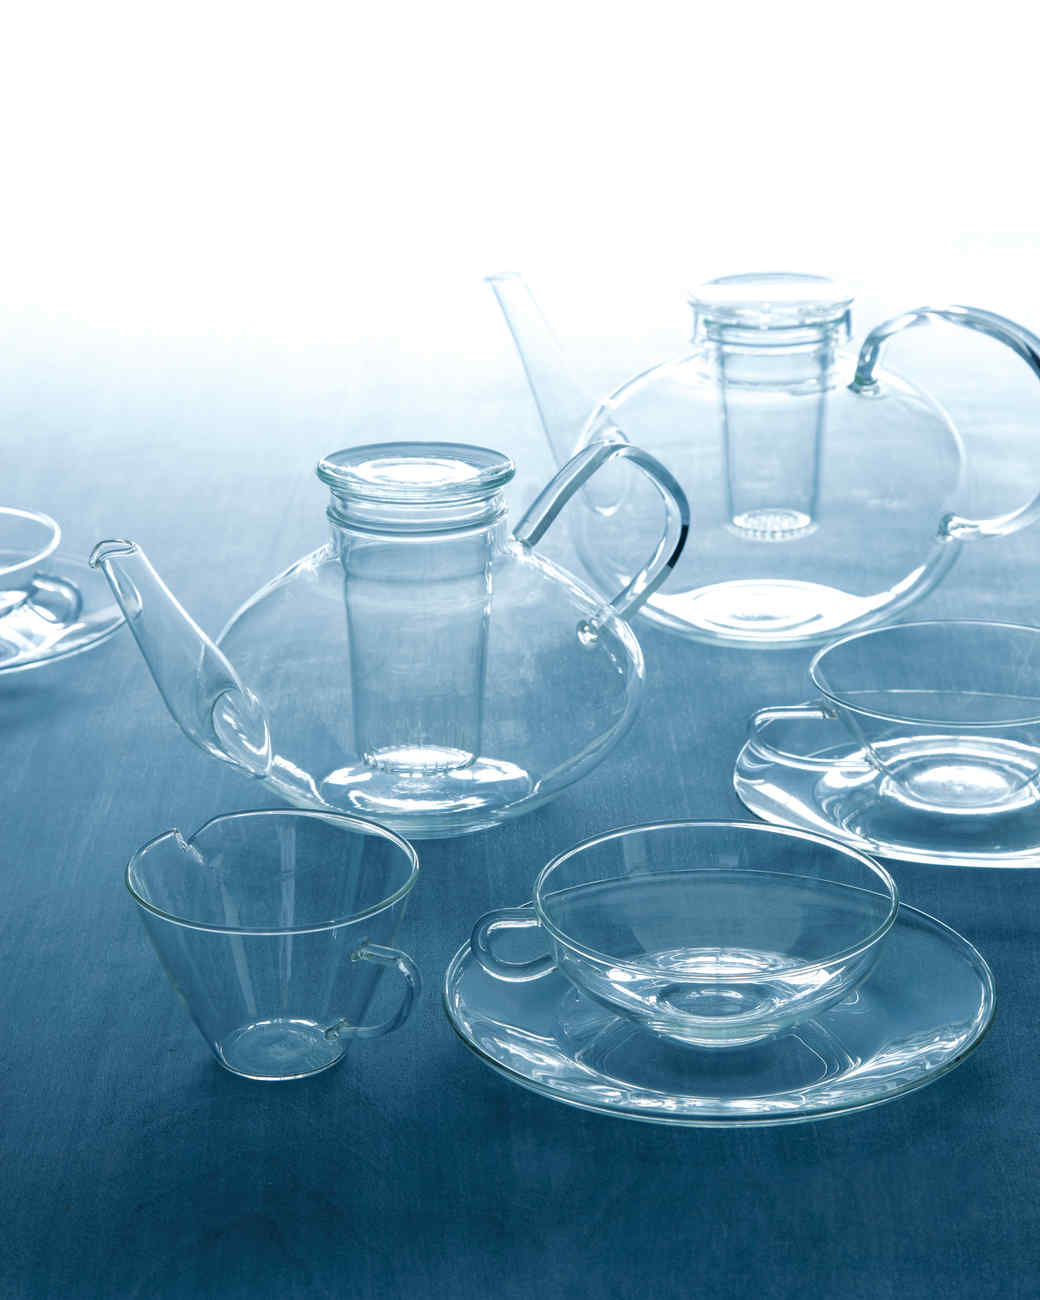 glass-tea-sets-md108967.jpg